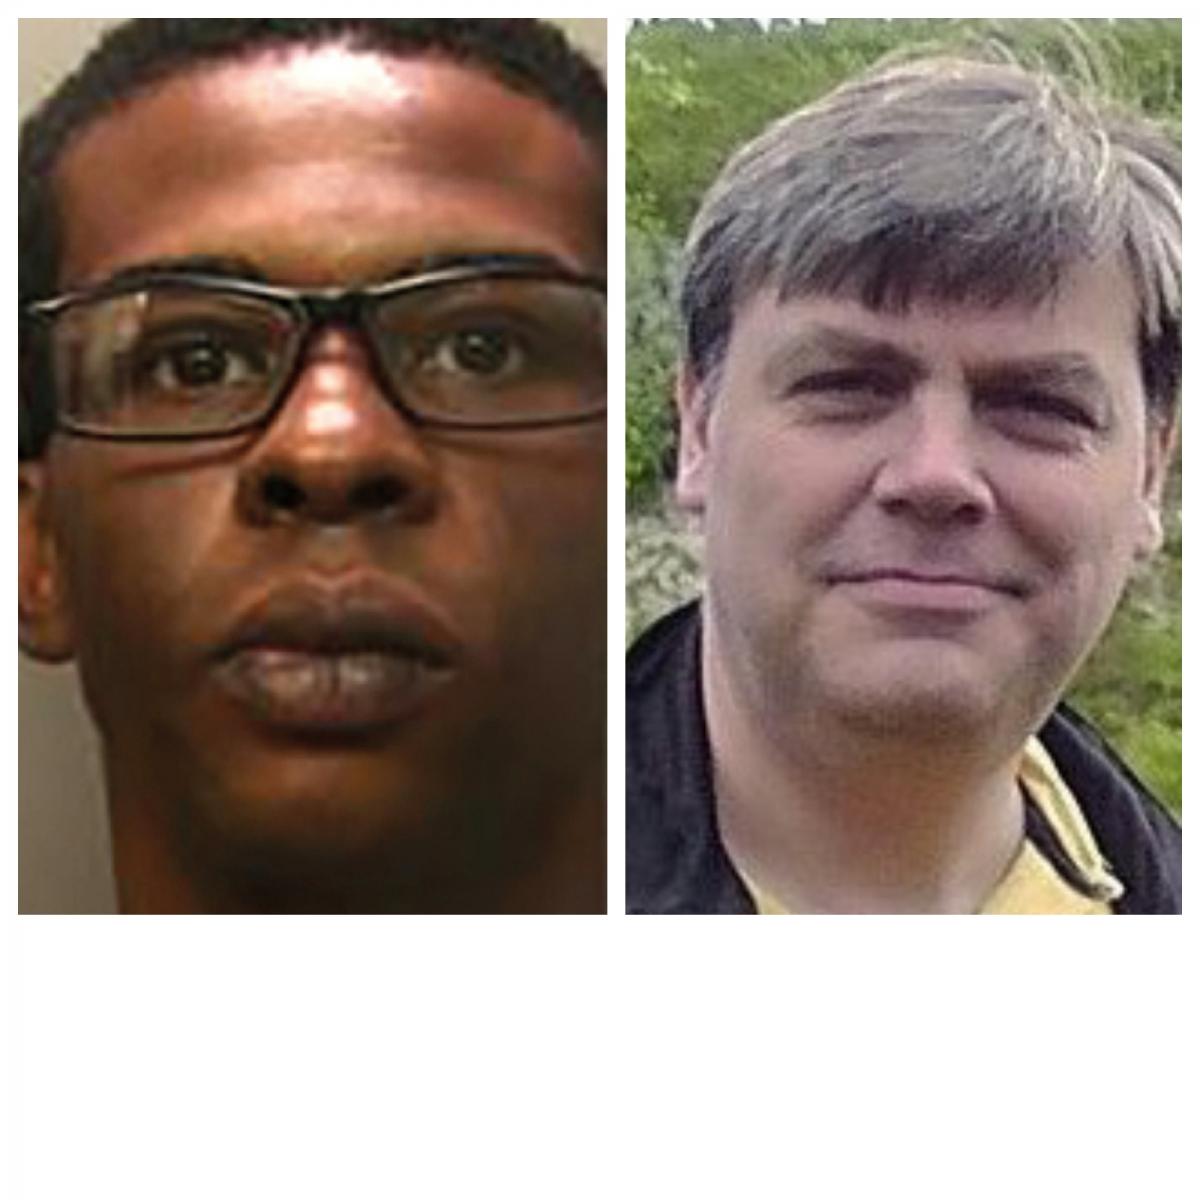 Darren Pencille (left) was jailed for the murder of Lee Pomeroy (BTP/PA)